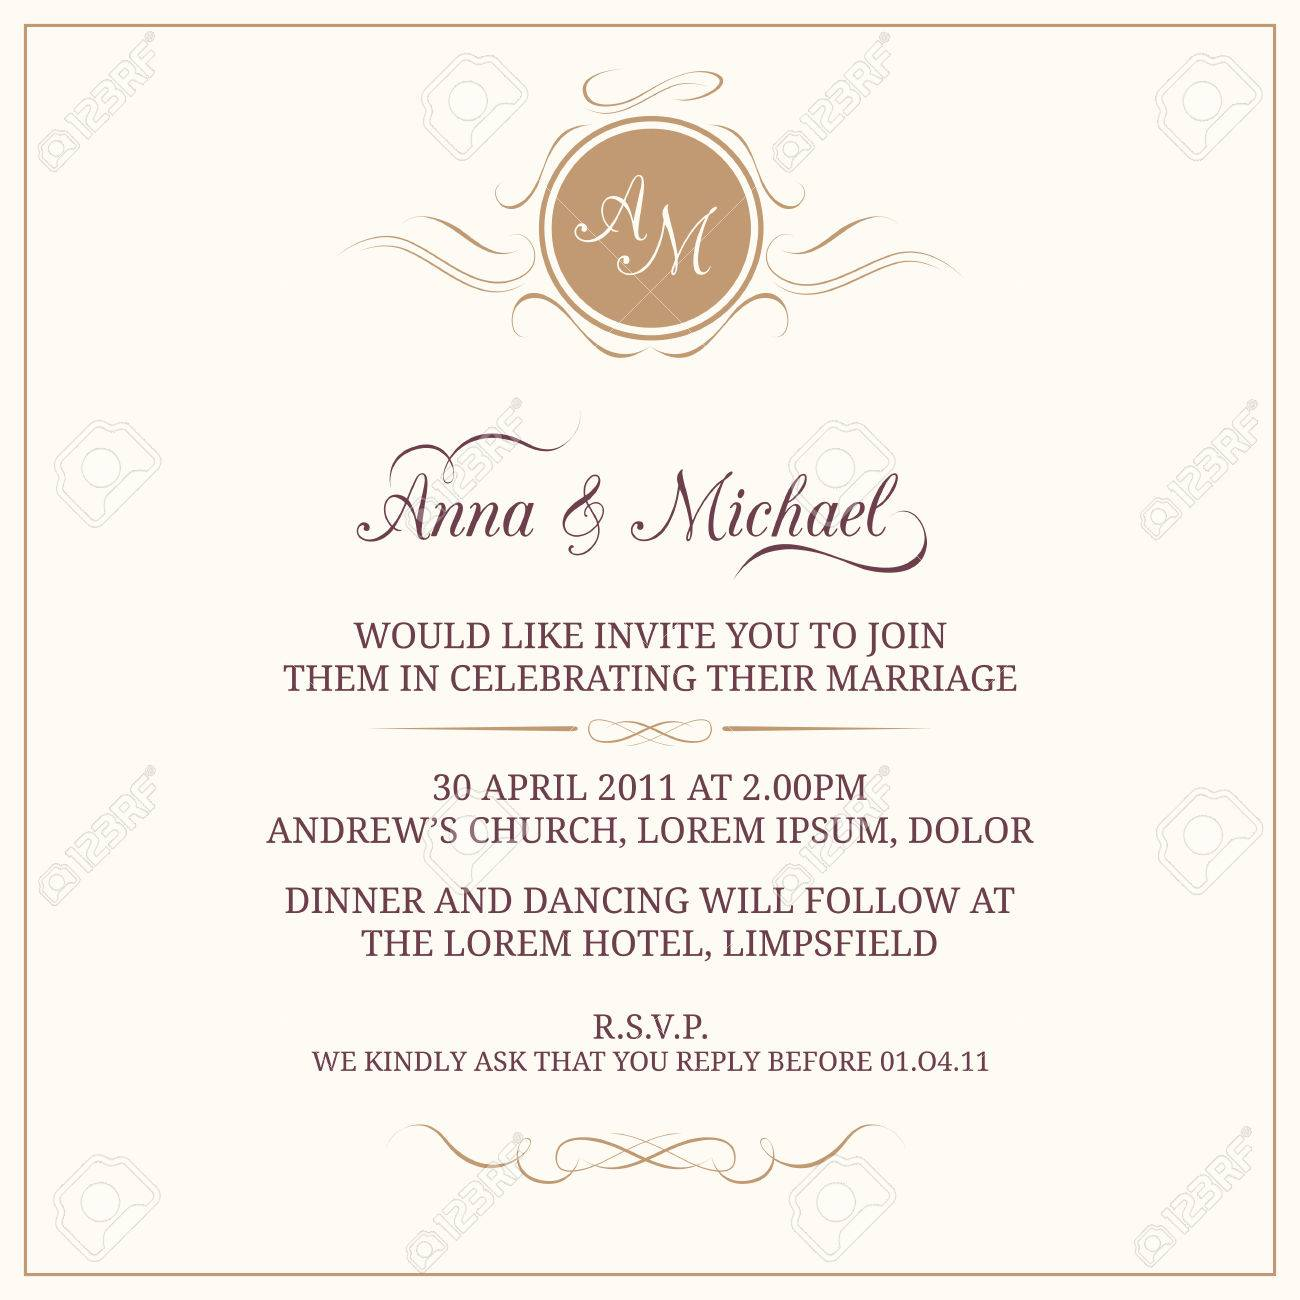 Invitation Card With Monogram Wedding Invitation Save The Date